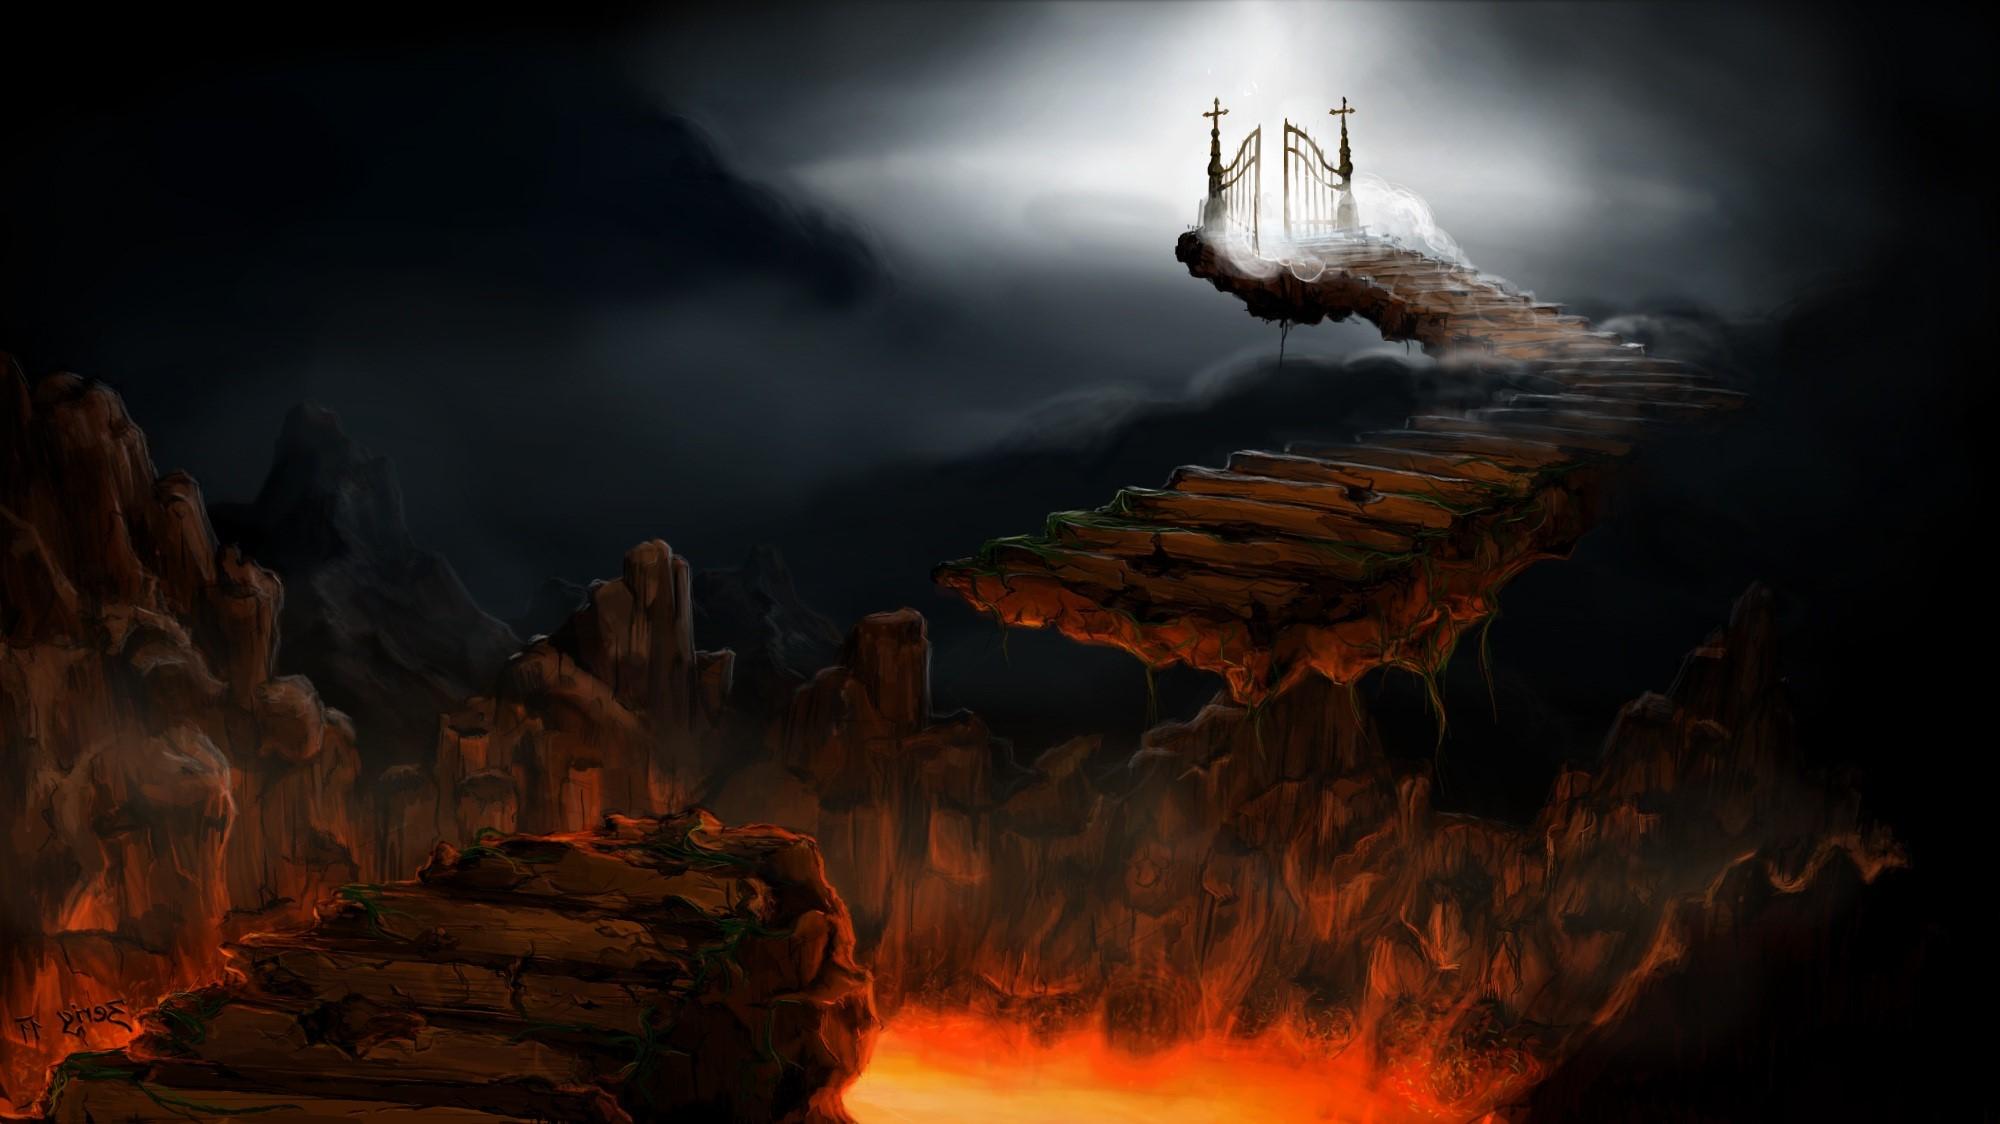 hell-735995